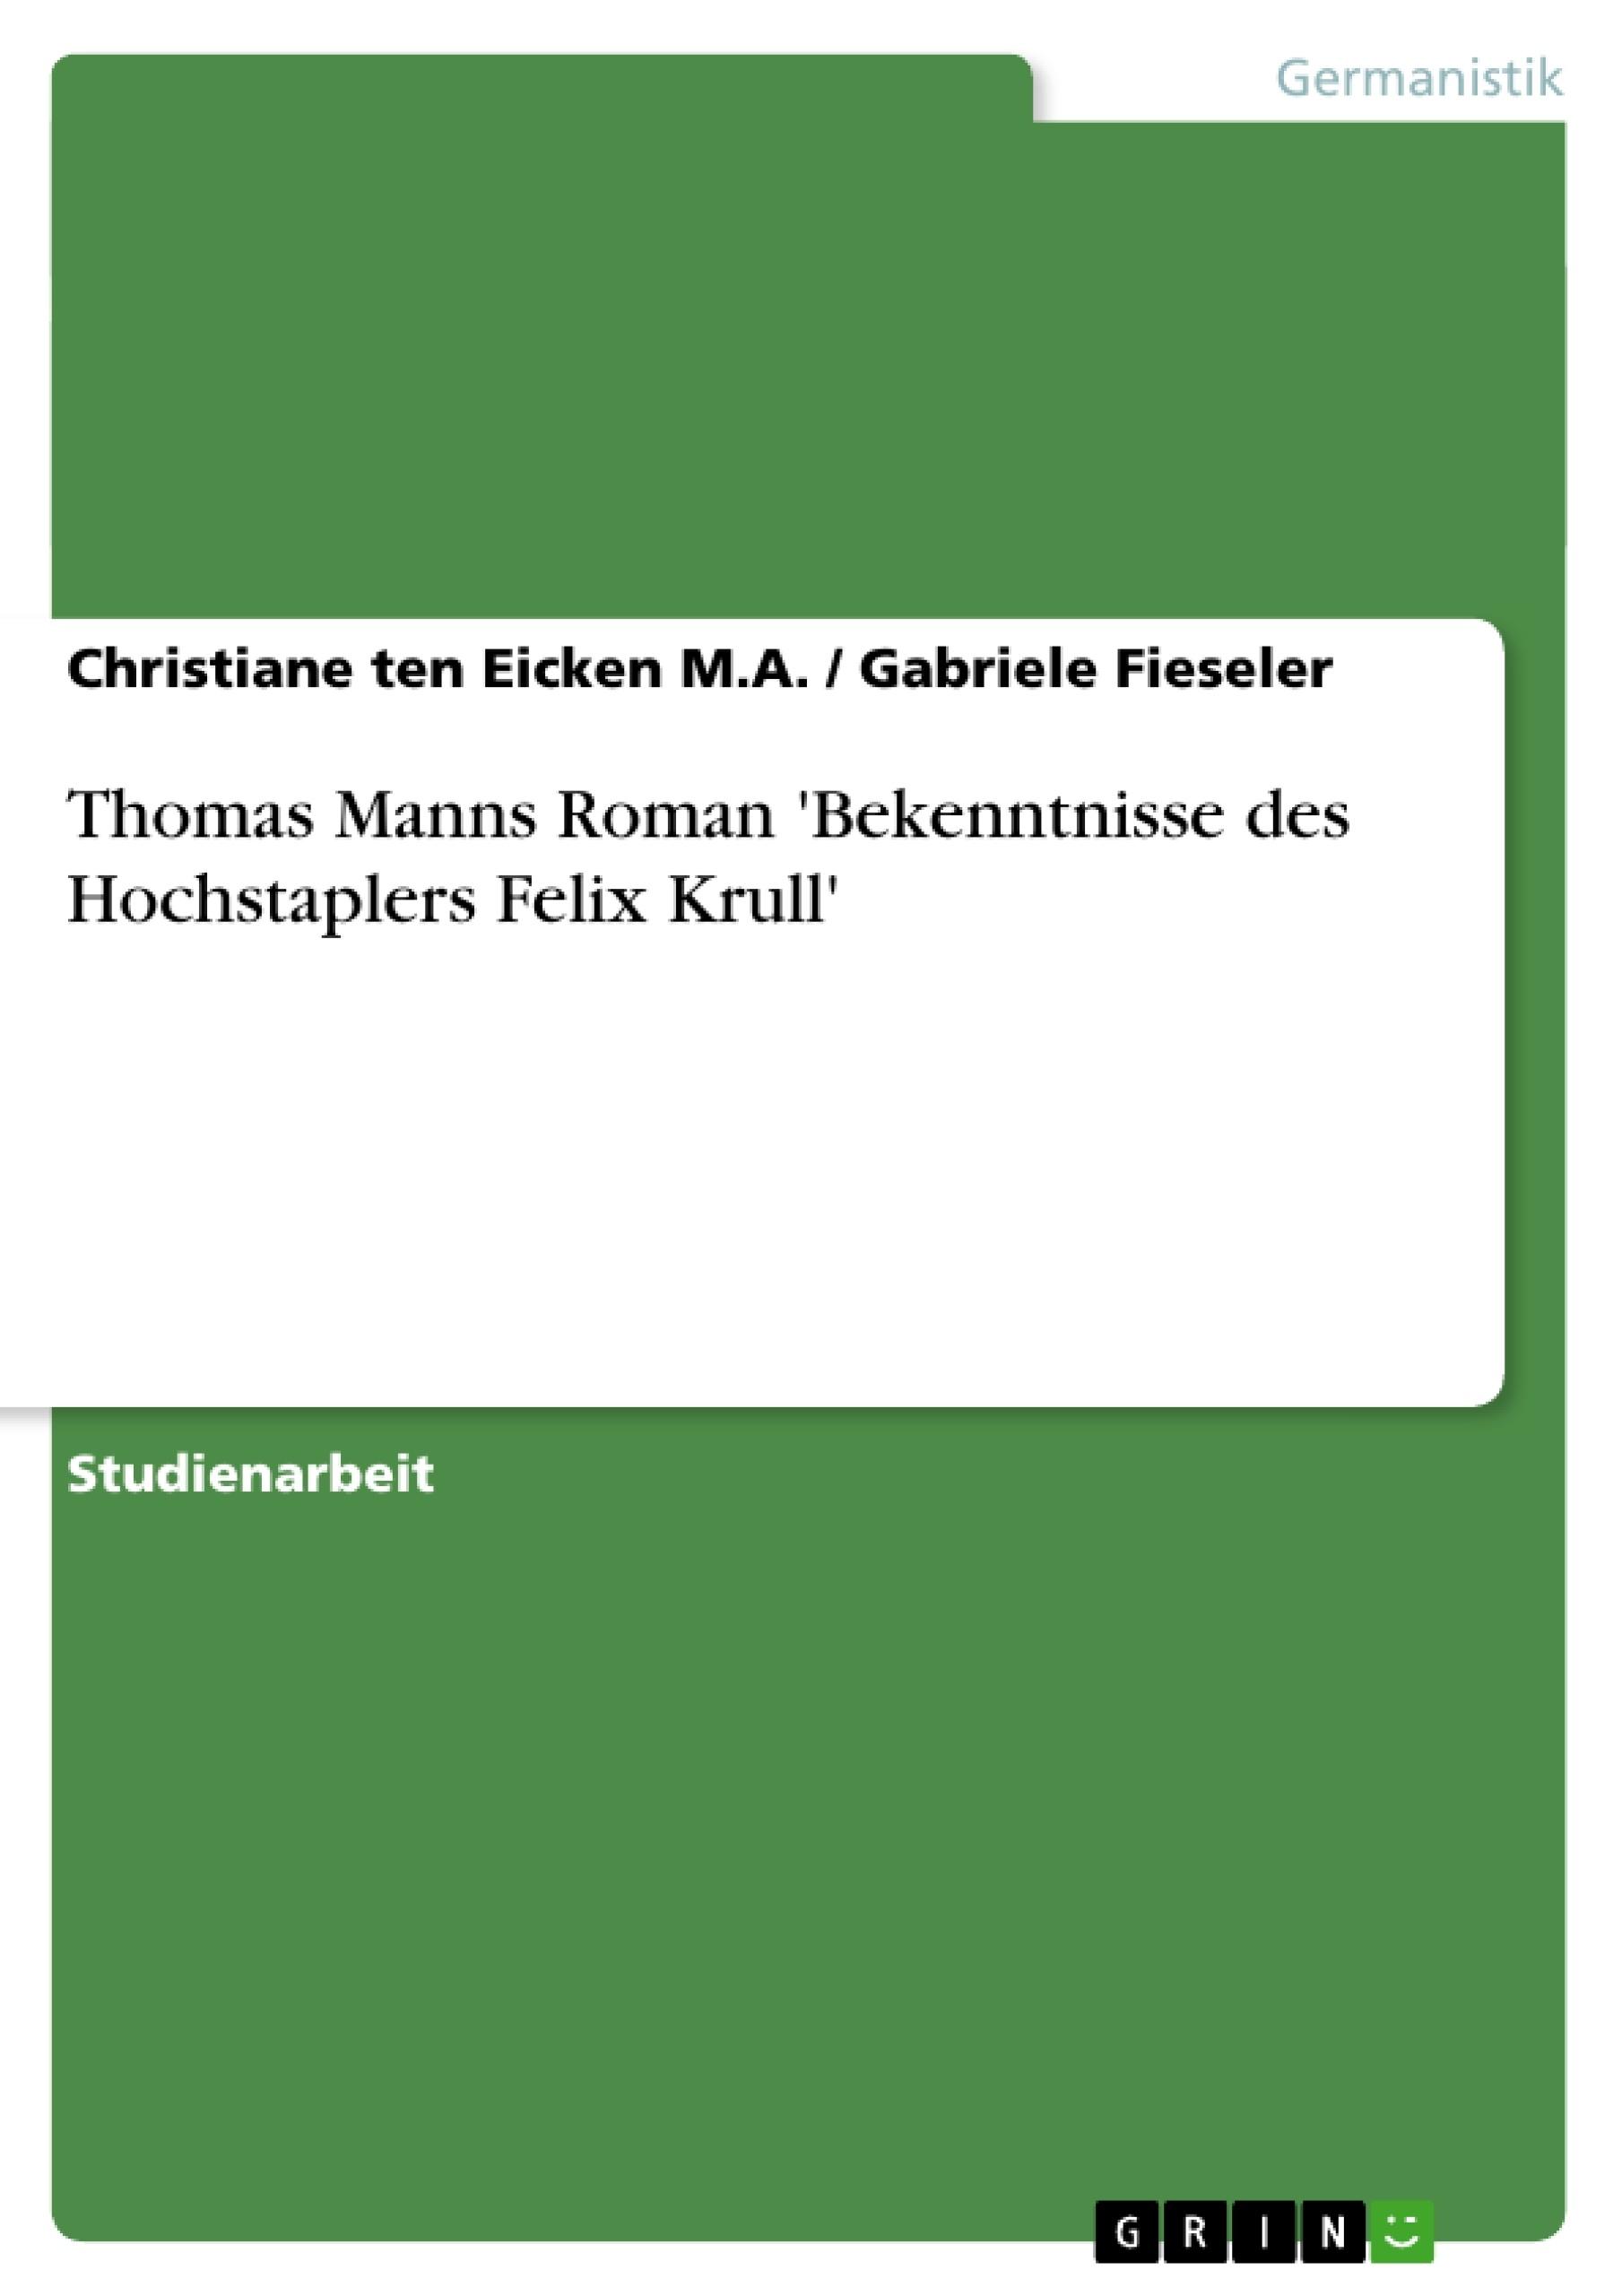 Titel: Thomas Manns Roman 'Bekenntnisse des Hochstaplers Felix Krull'